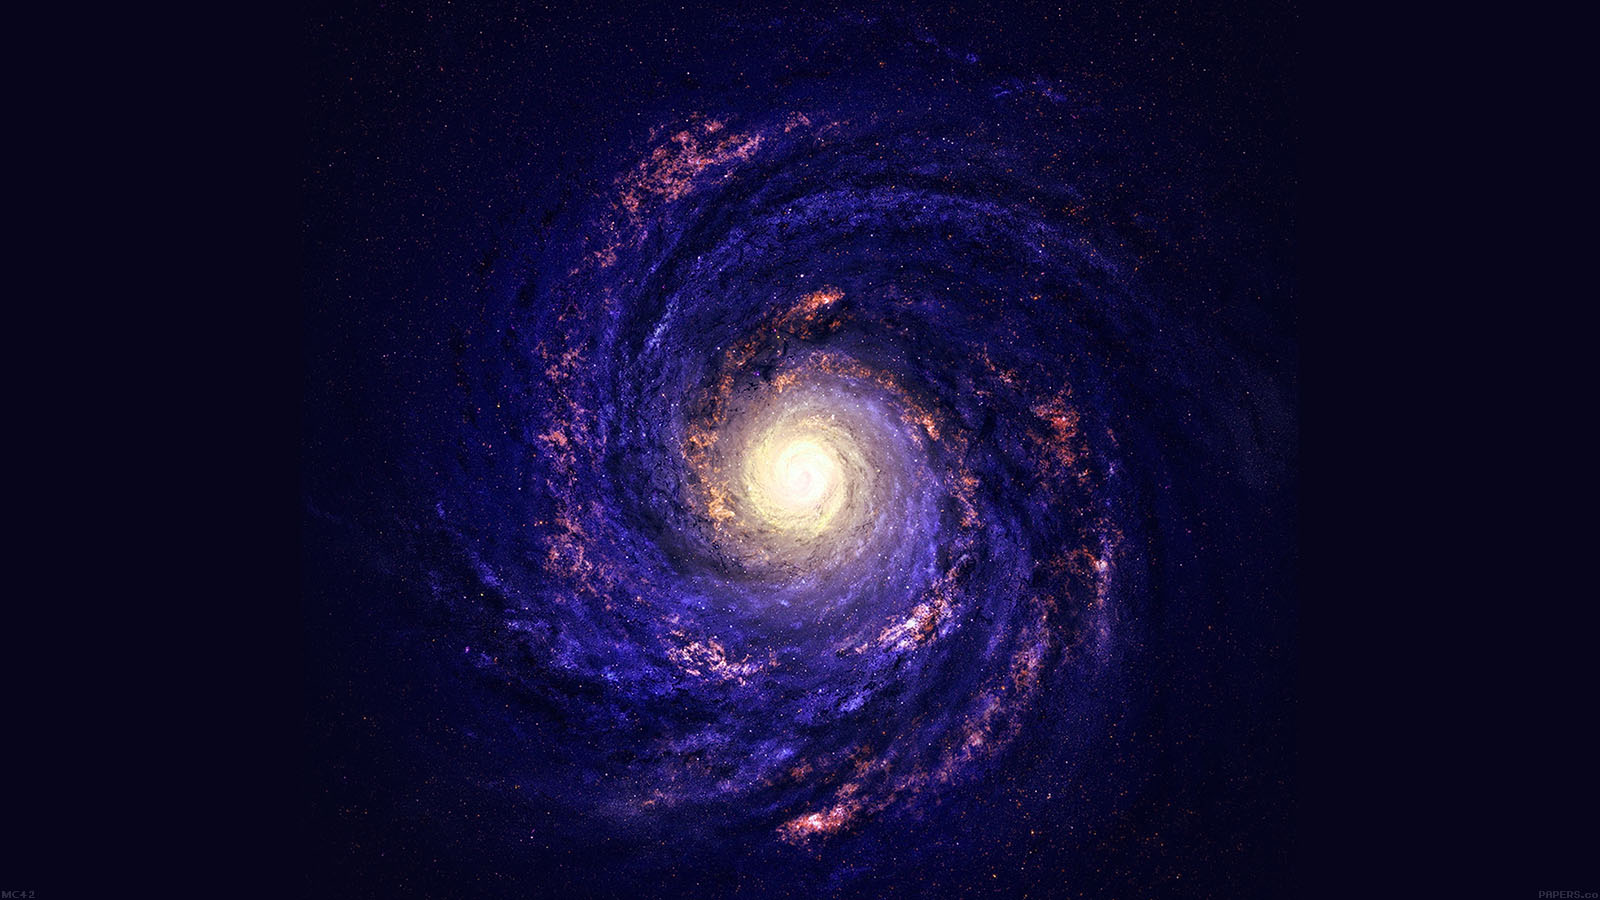 Iphone 6s Plus 4k Wallpaper: Mc42-wallpaper-space-galaxy-stars-milky-way-blue